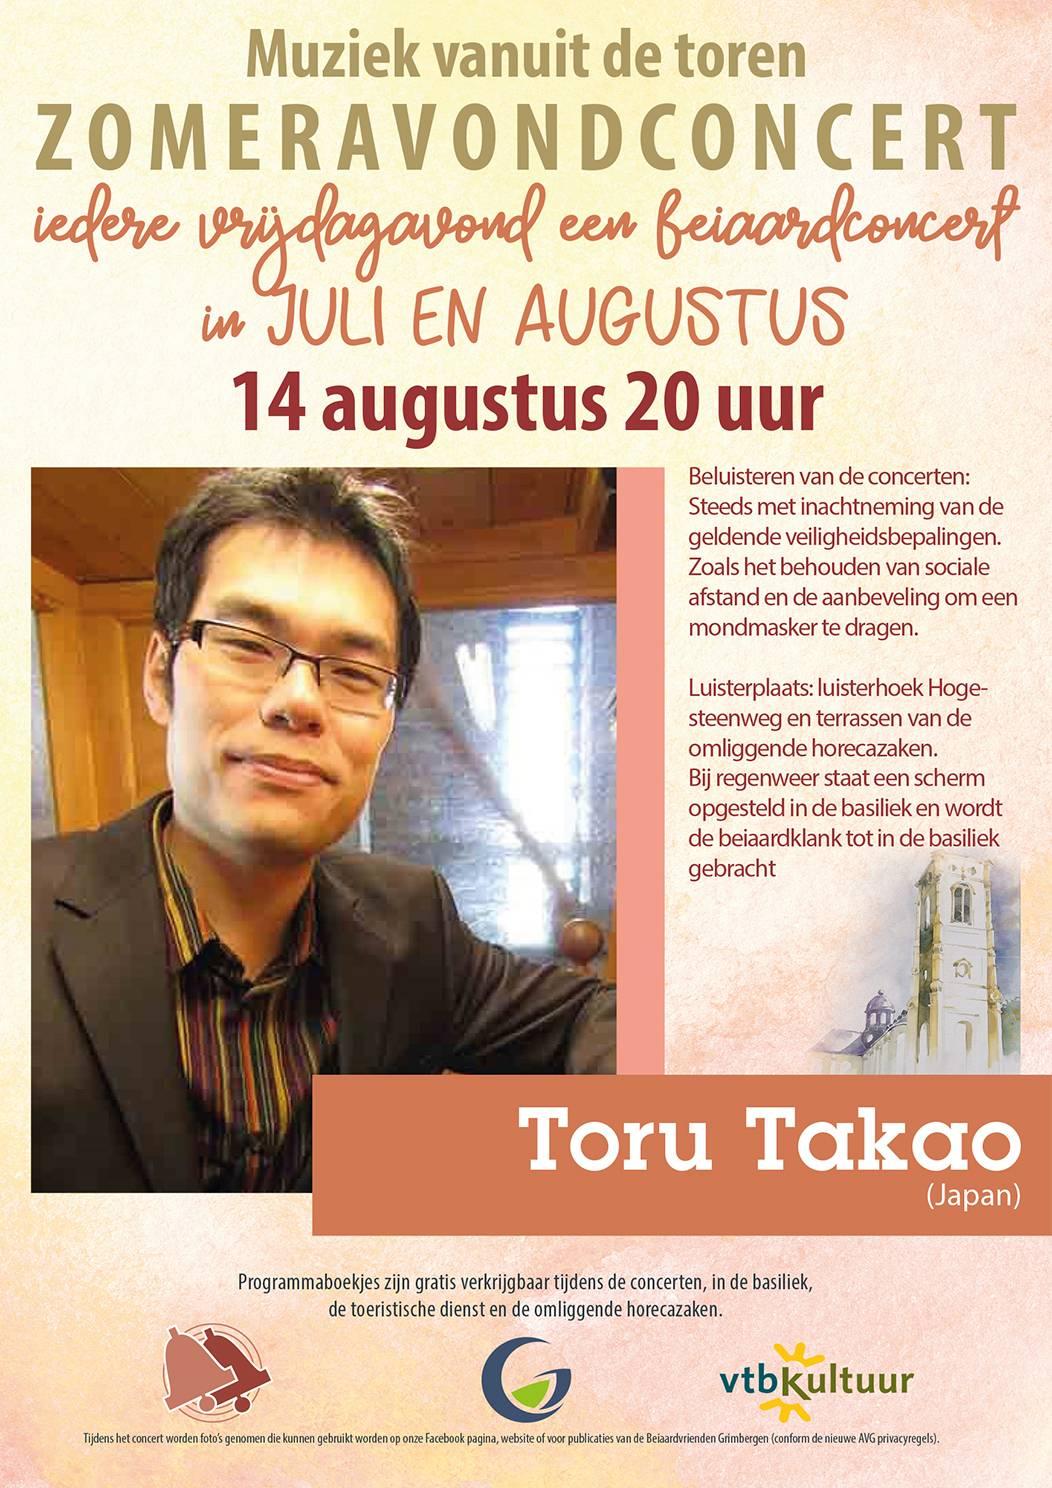 Zomeravondconcerten - Toru Takao (Japan)